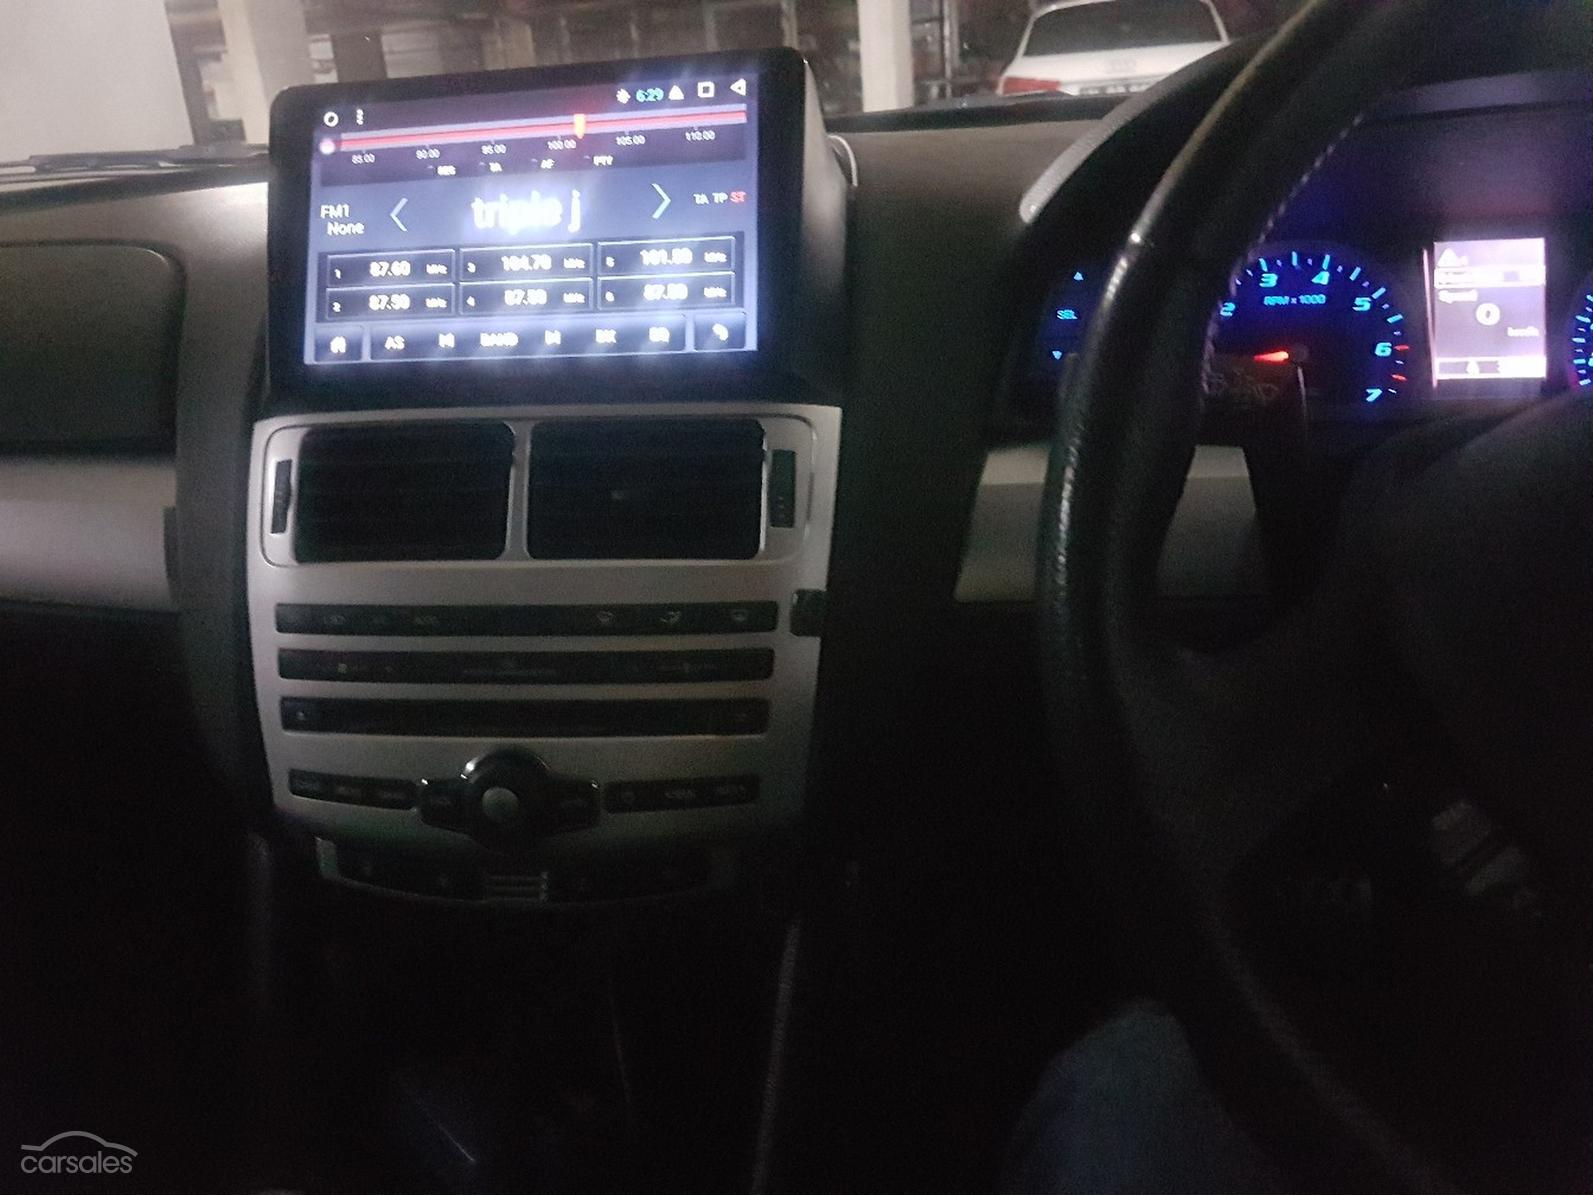 2012 Ford Falcon Ute XR6 Turbo FG MkII Manual Super Cab-SSE-AD-5925925